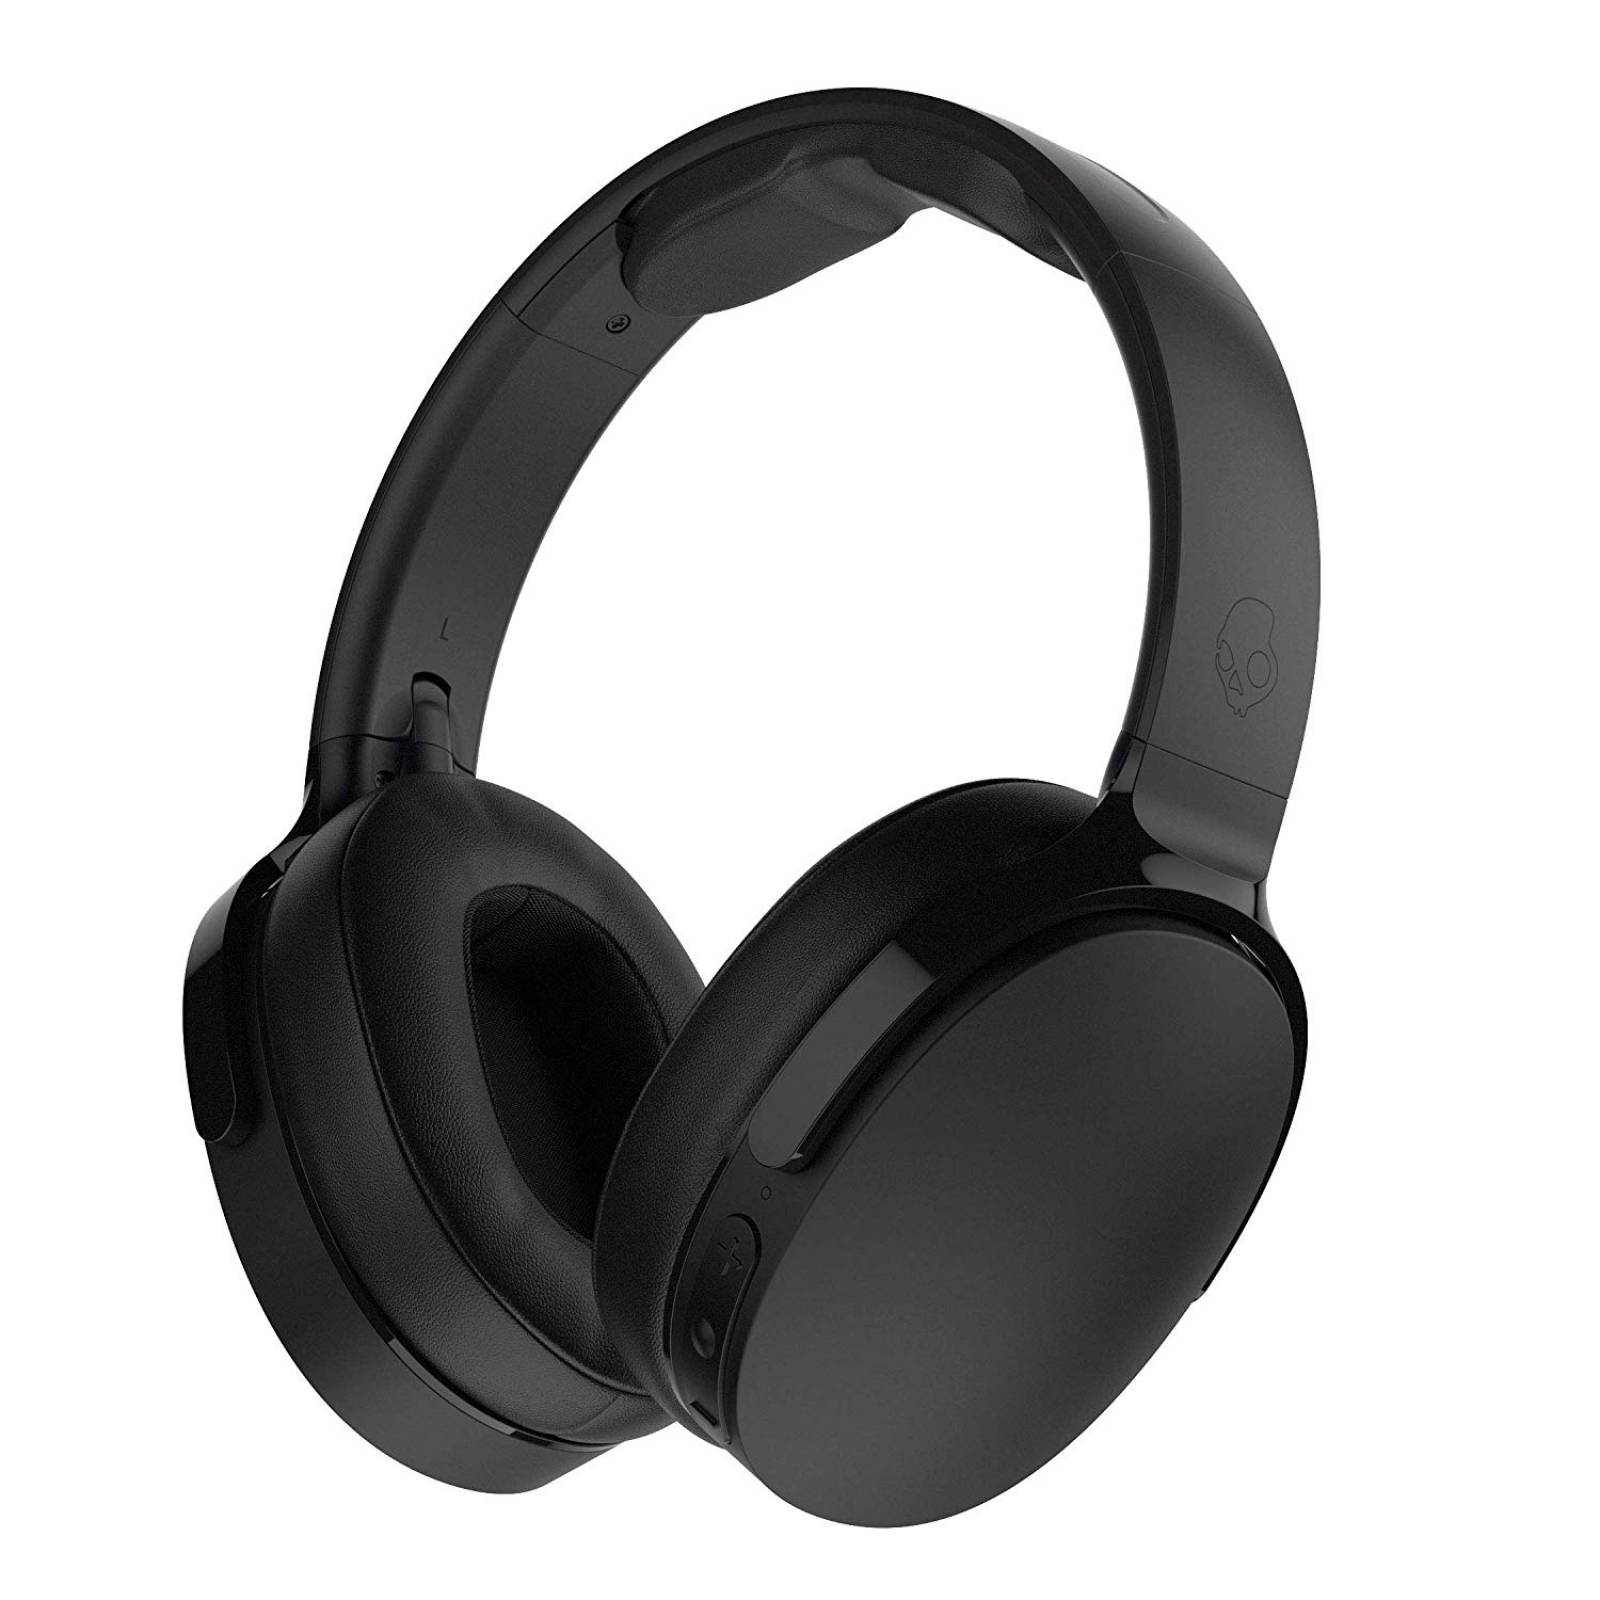 Audifonos Skullcandy Hesh 3 Bluetooth Hesh 3 Negro S6HTW-K033